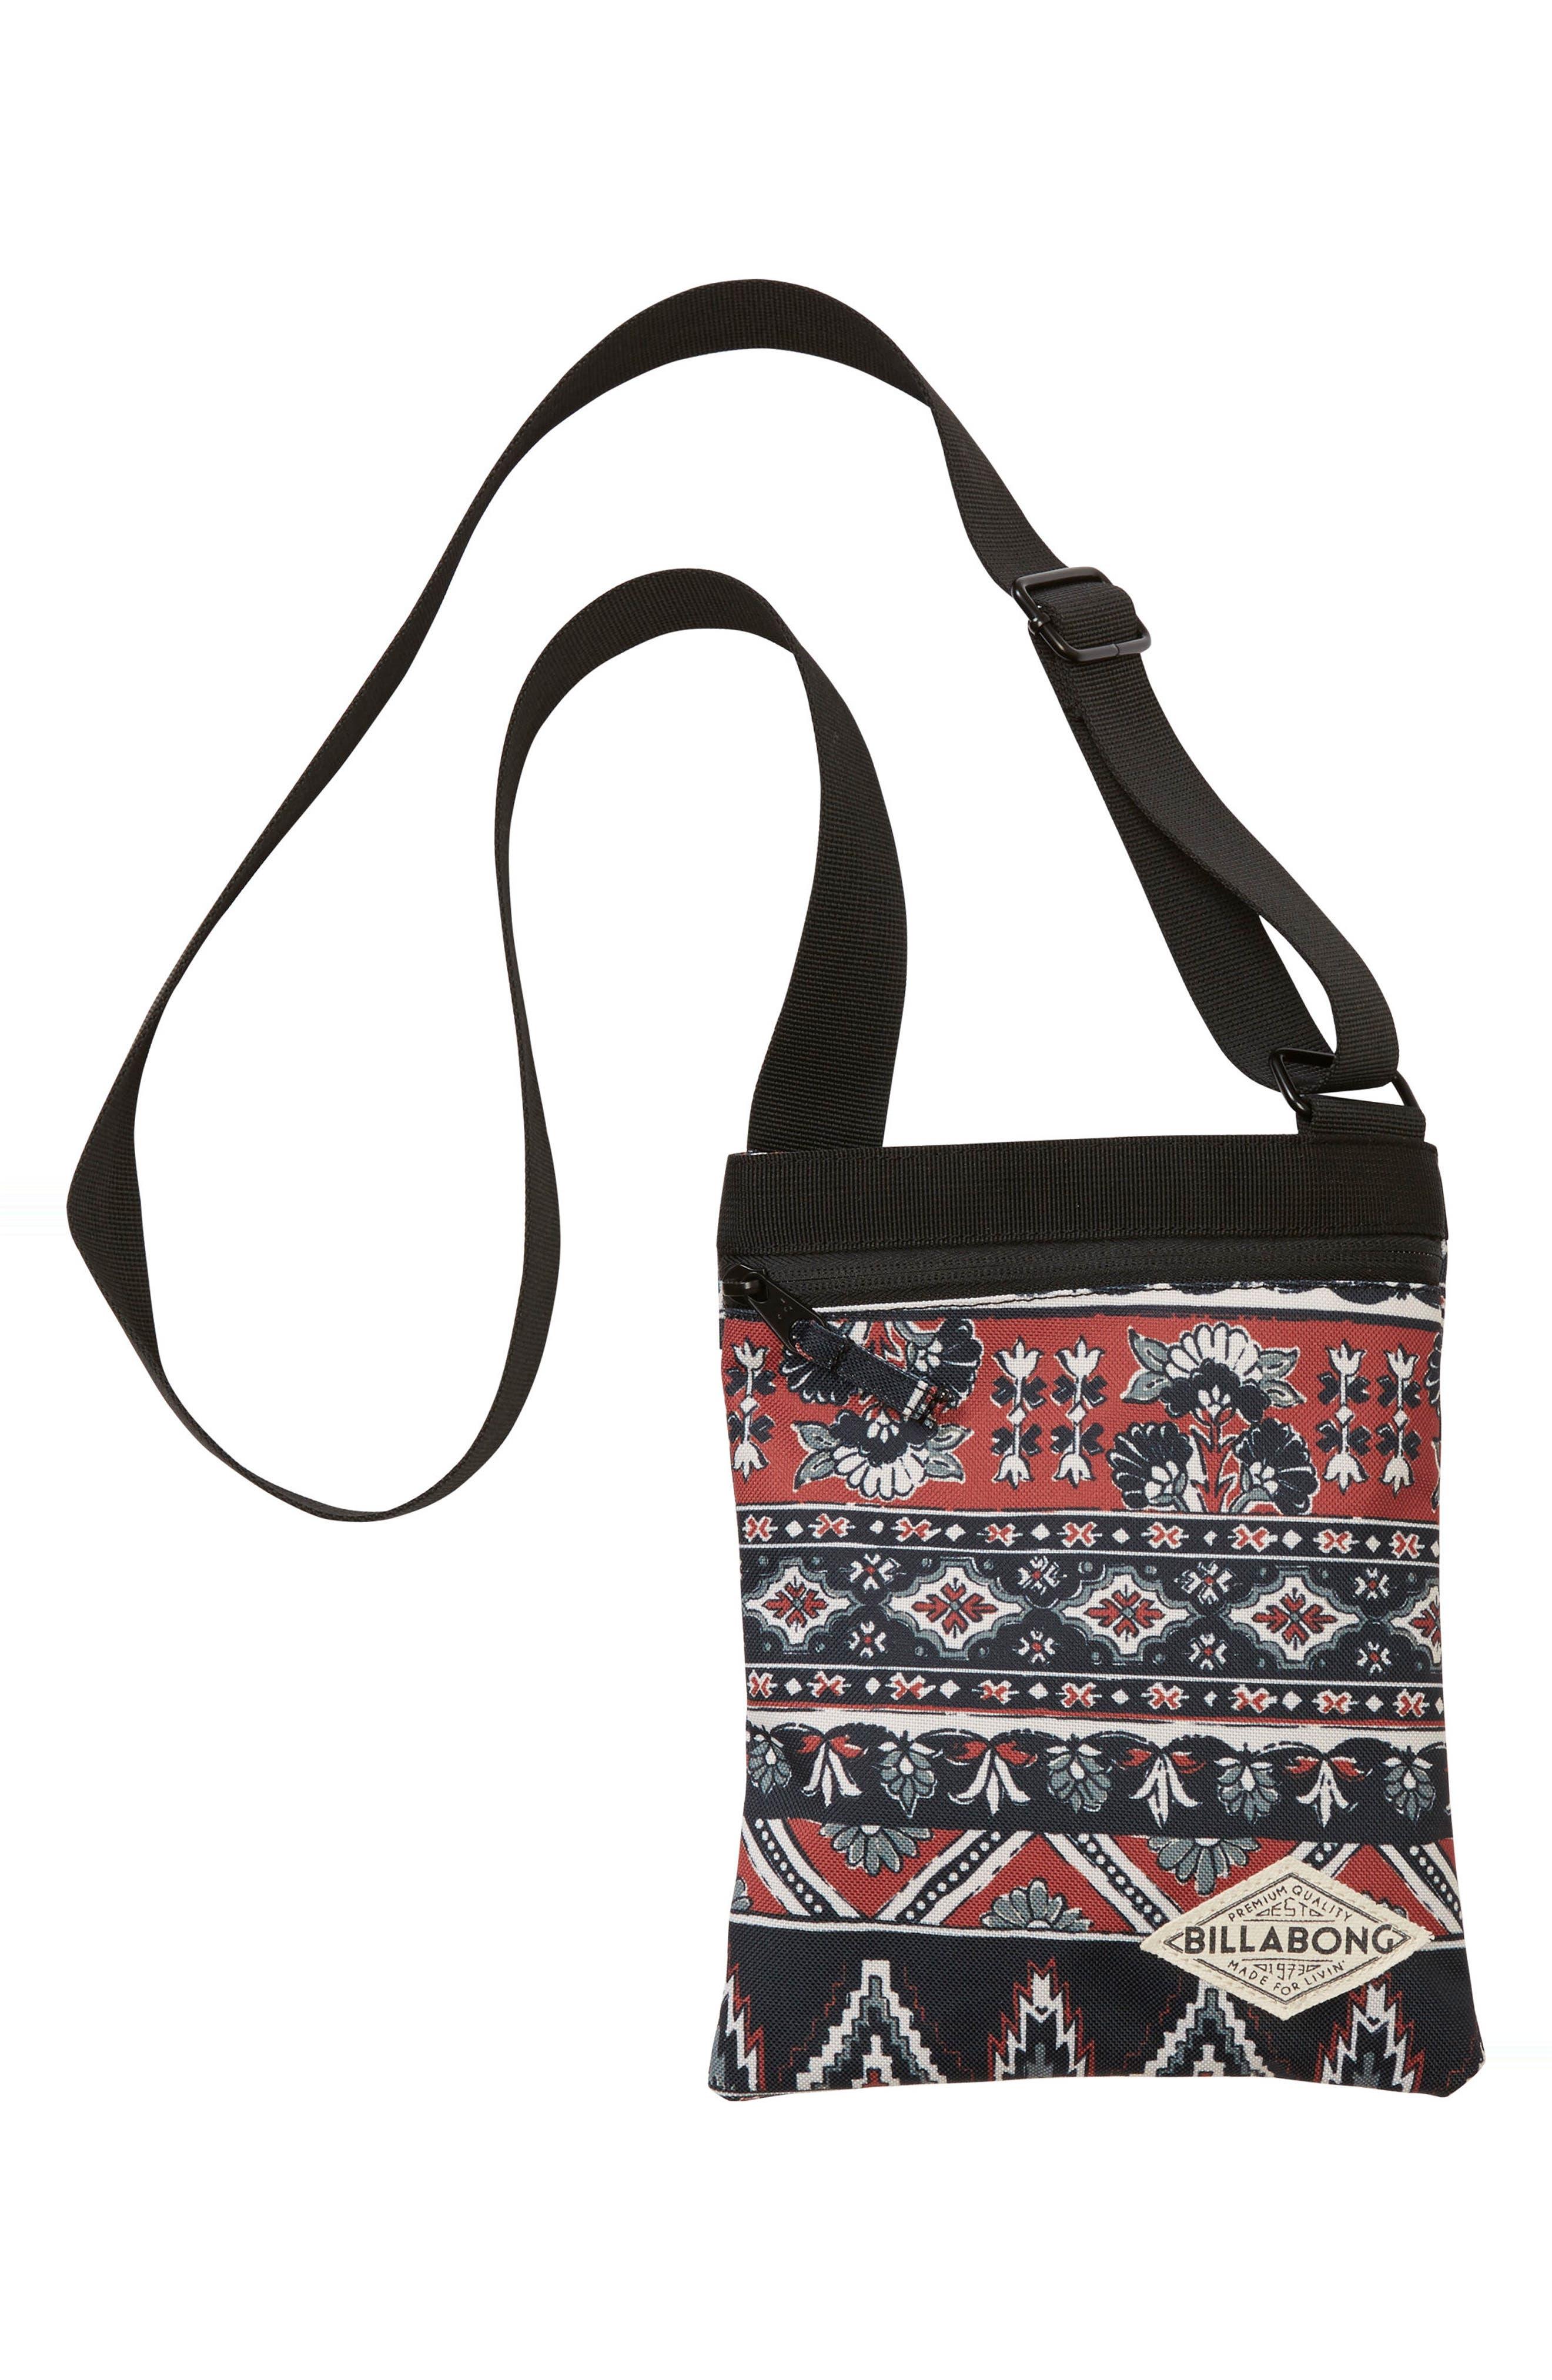 Billabong Good Vibes Crossbody Bag